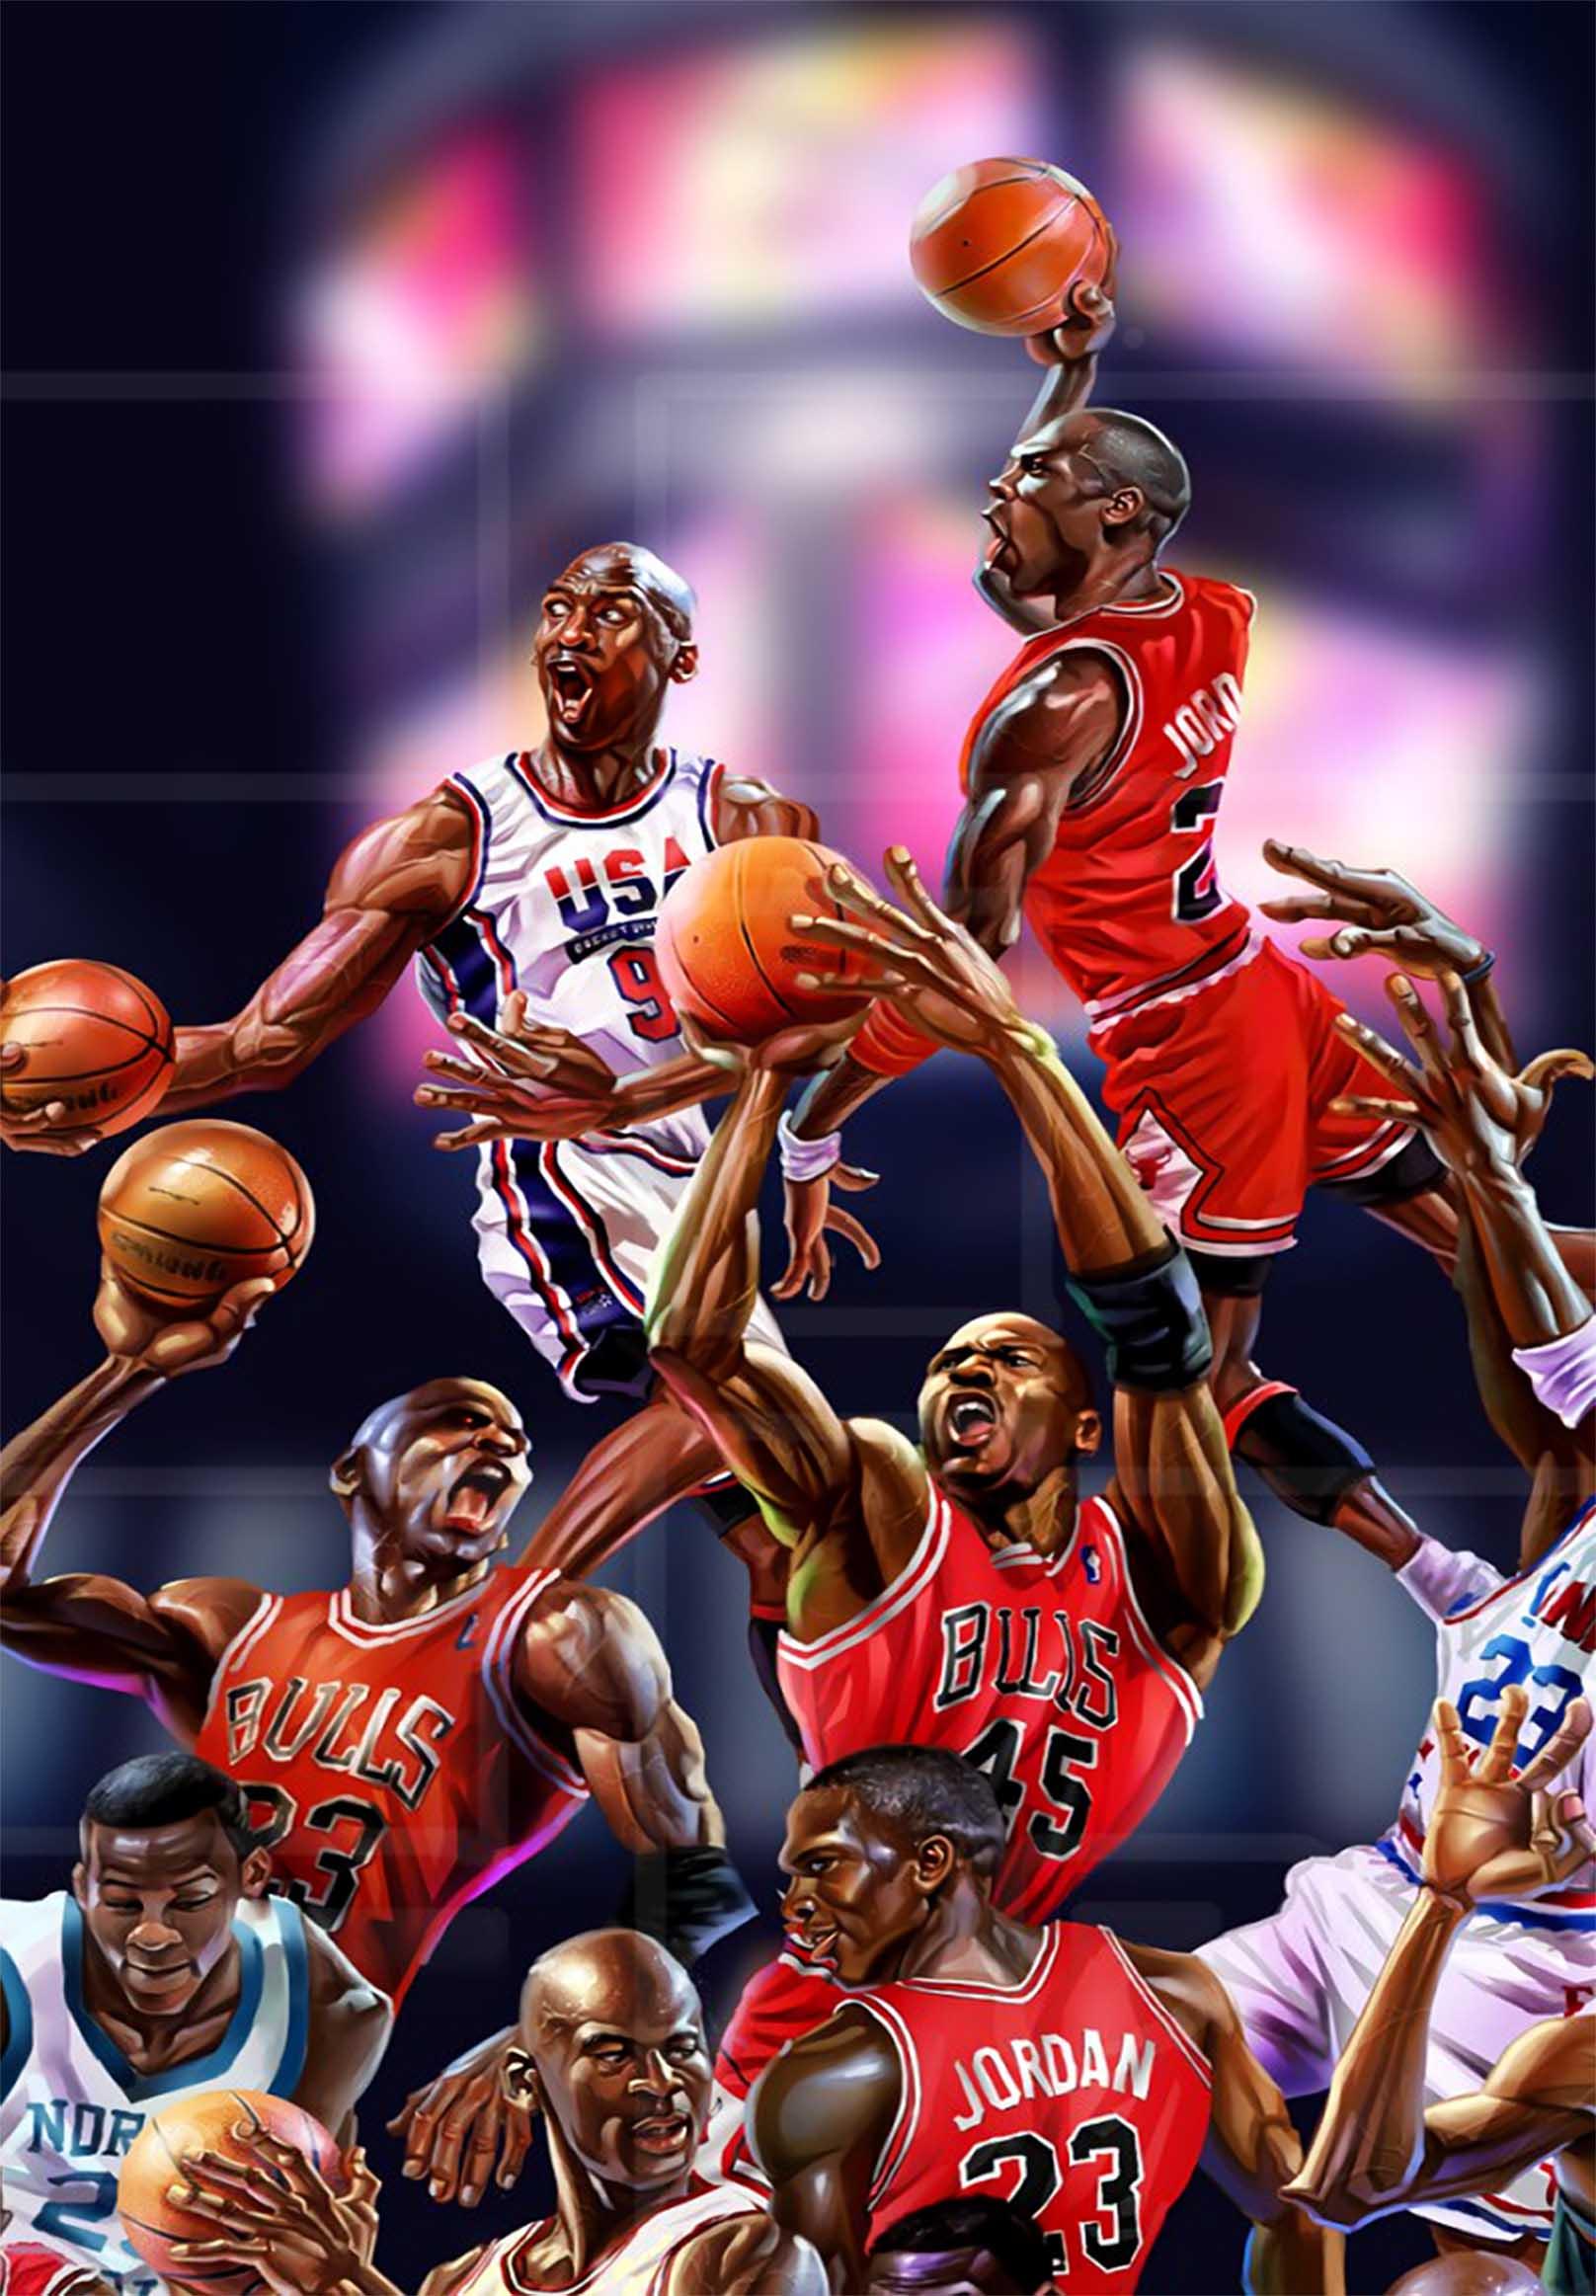 Air Jordan  Michael Jordan Canvas Tablo (Nba-canvas-jordannew1)